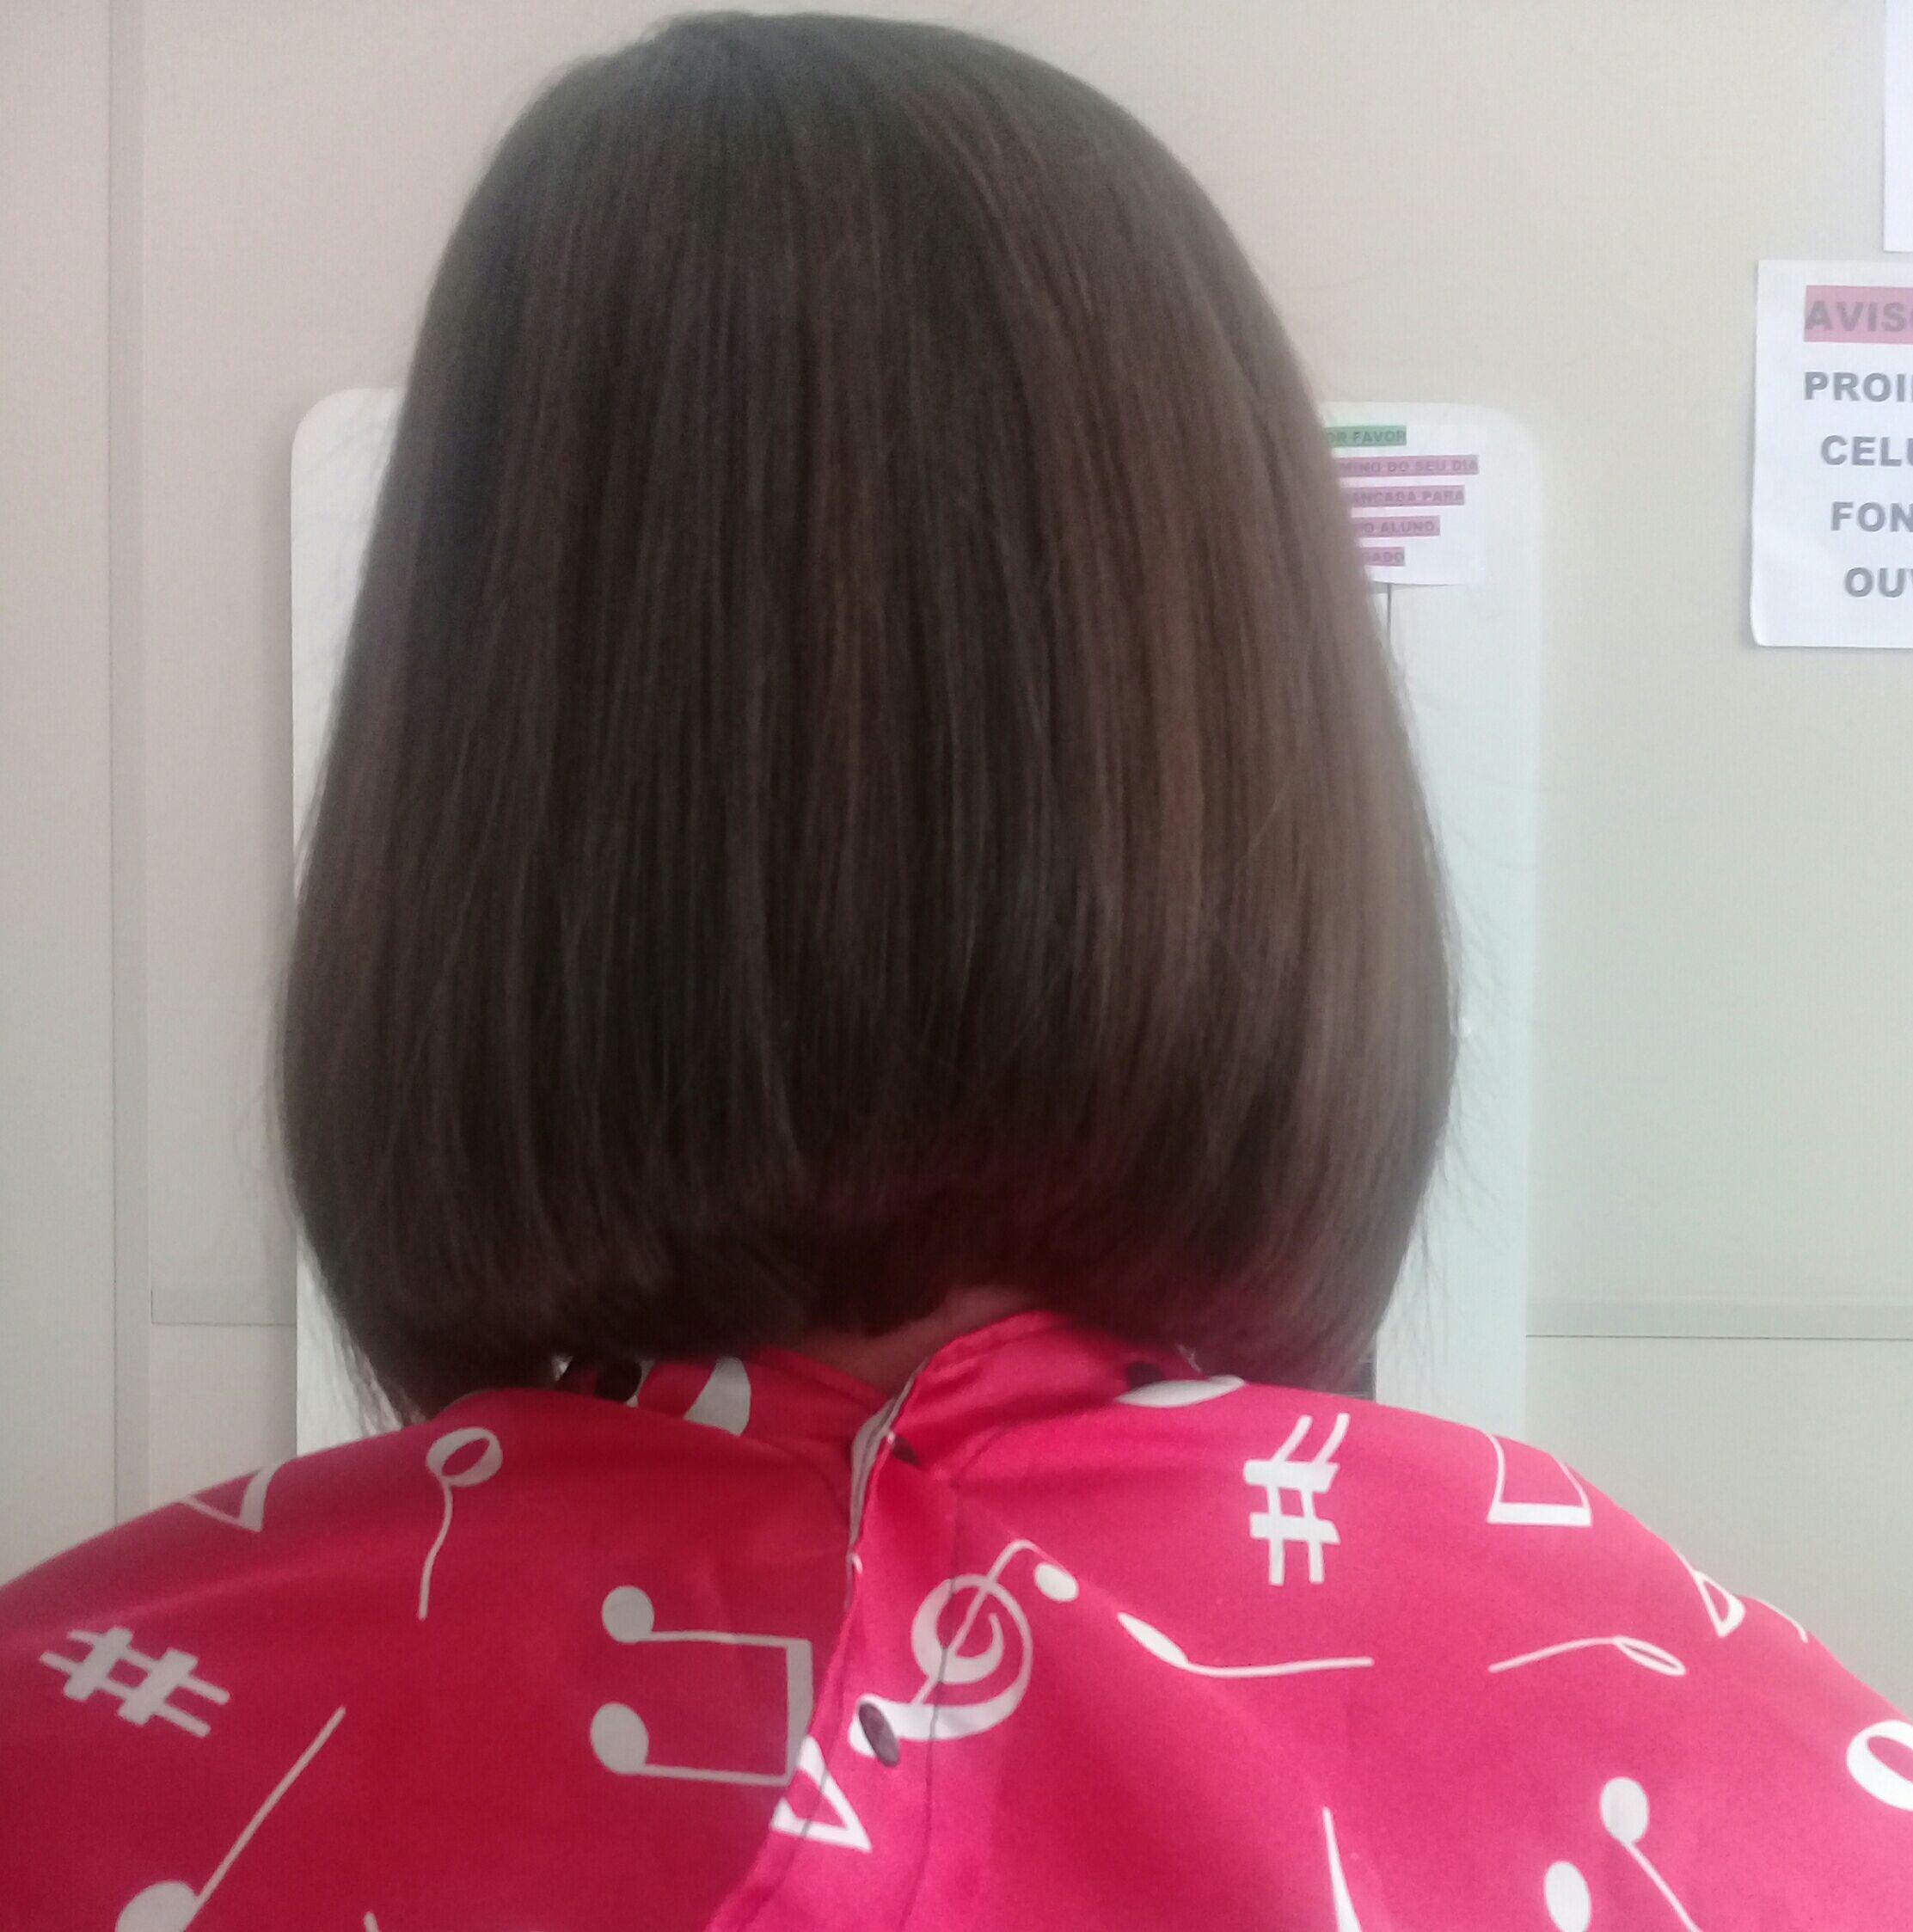 Cliente: Escova /Chapinha cabelo auxiliar cabeleireiro(a) auxiliar cabeleireiro(a)